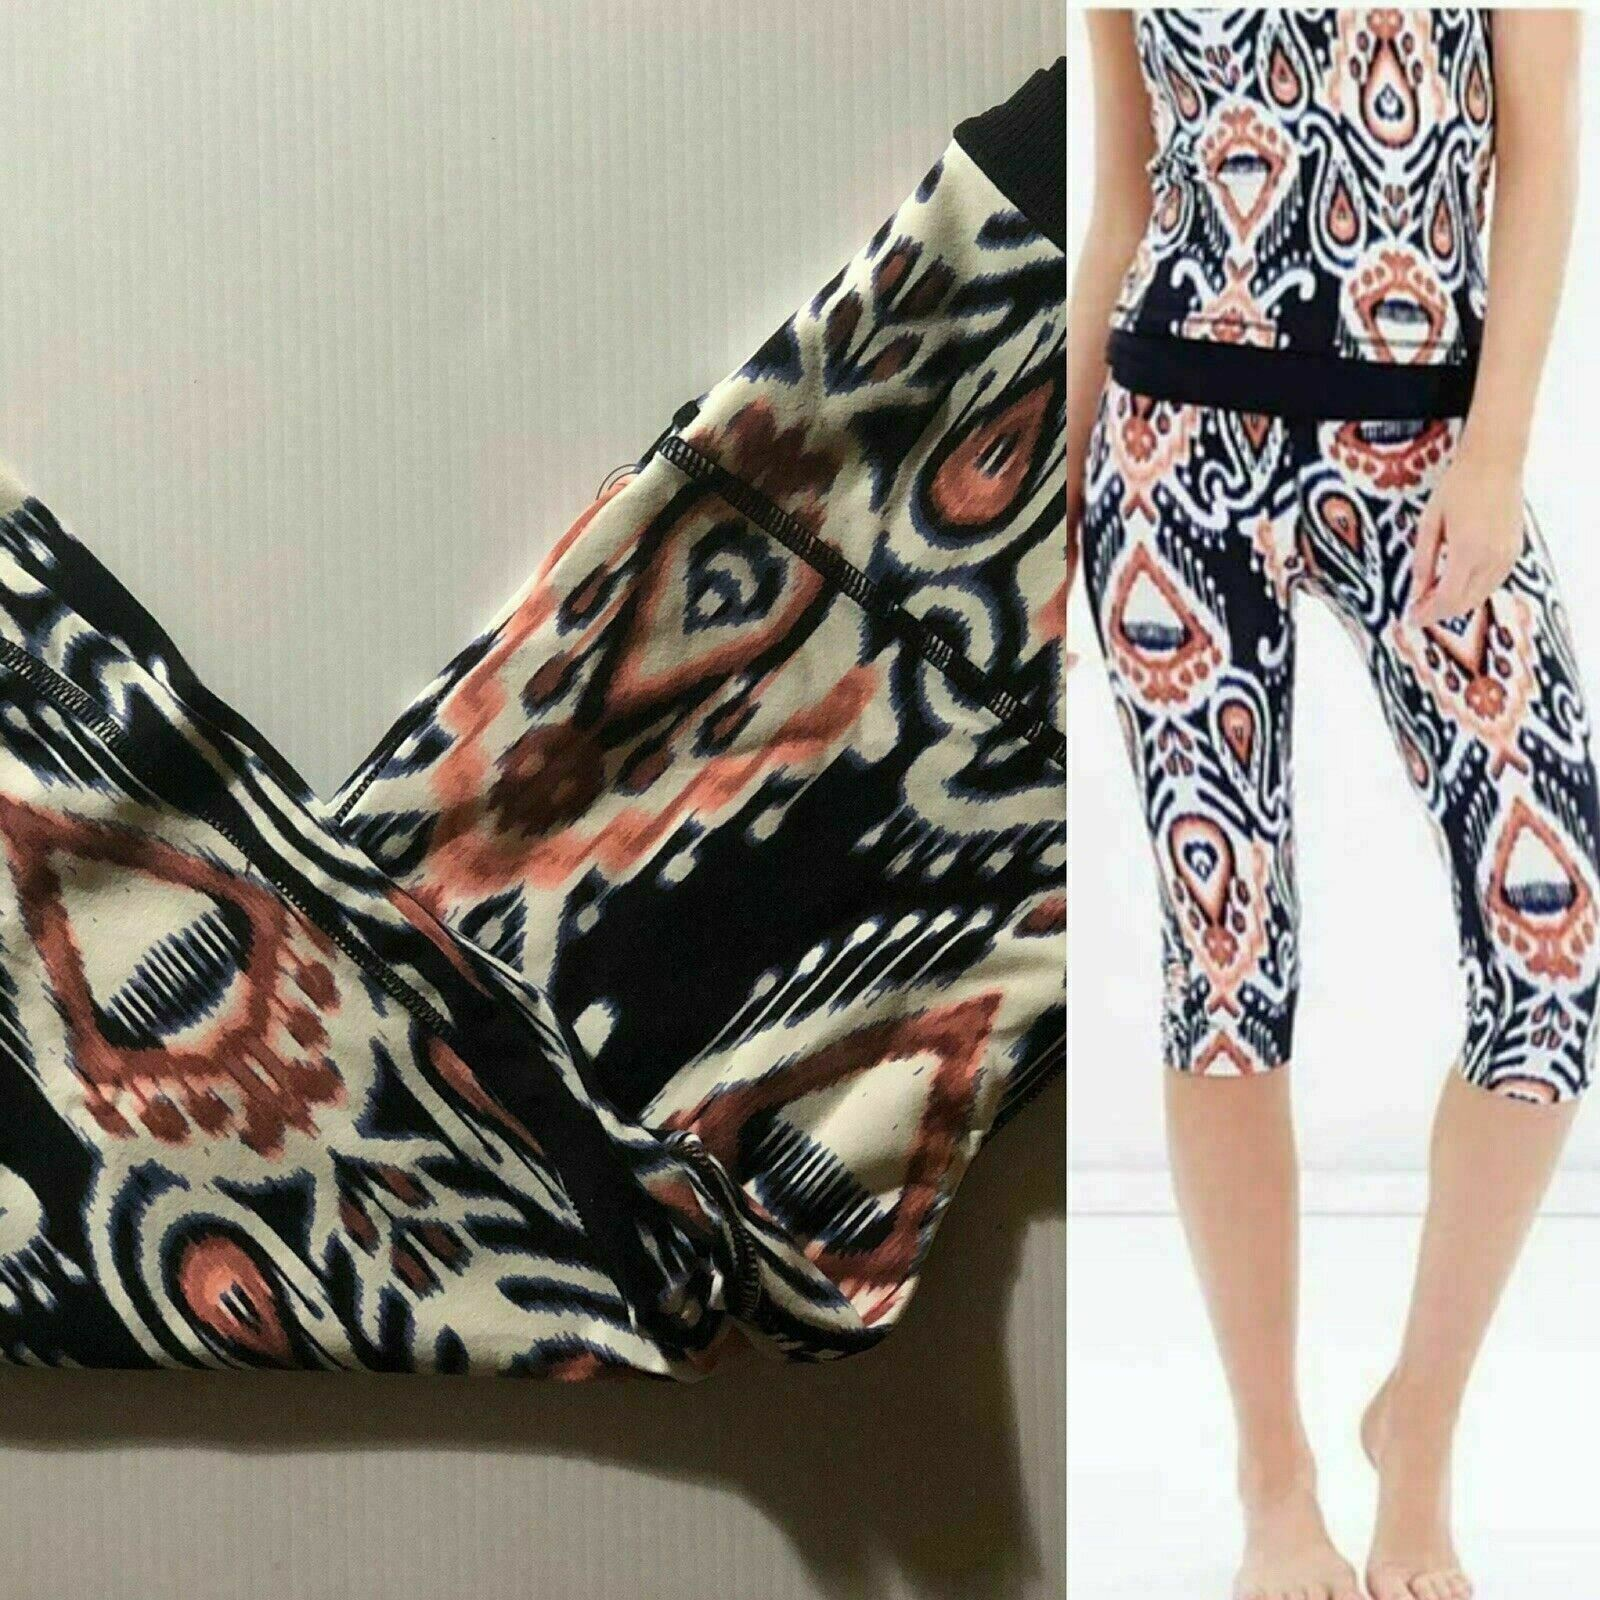 O'NEILL Women's Evoke Crop Legging Multi color pants Size S M L